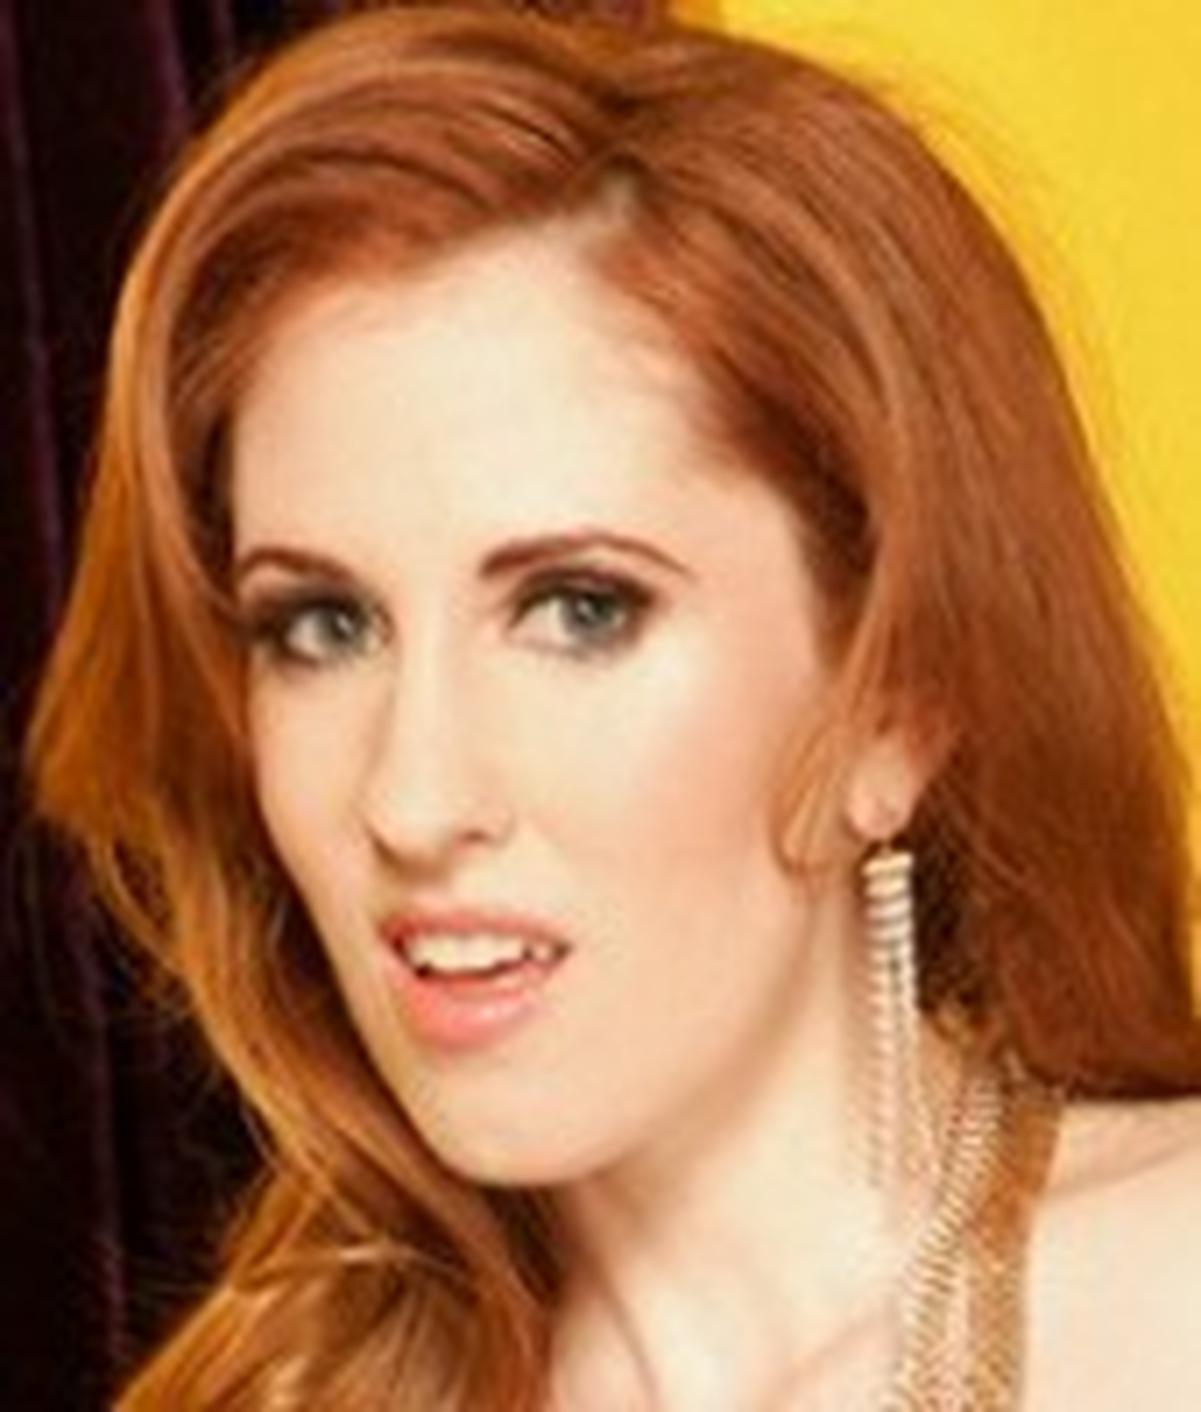 Natali DeMore Wiki & Bio - Pornographic Actress